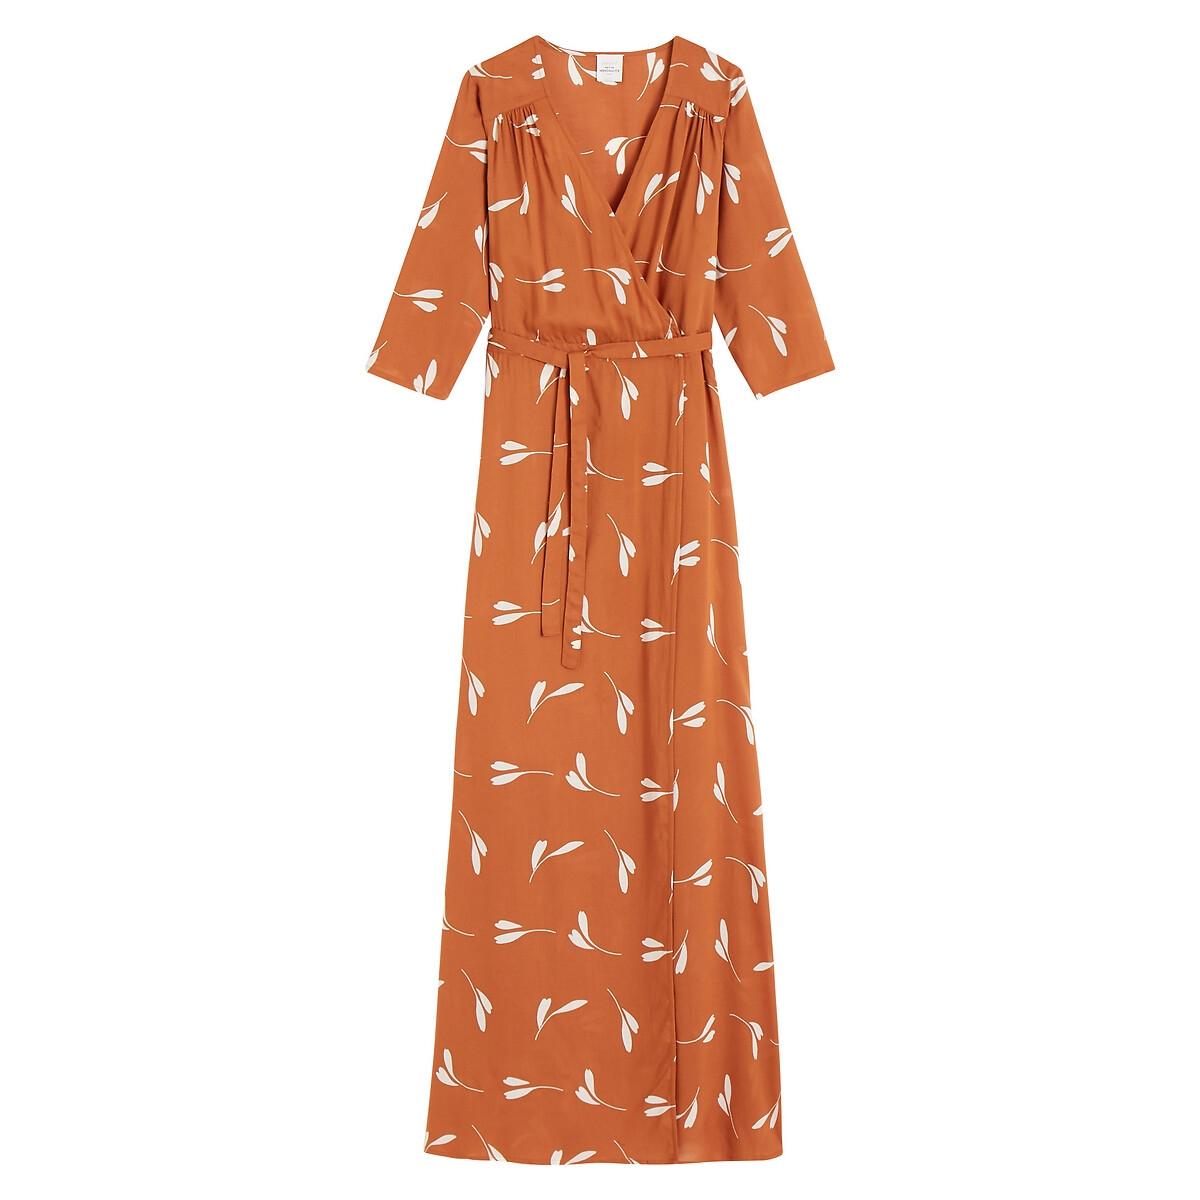 Платье La Redoute С запахом и принтом длинное MARIE LOUISE XS каштановый платье длинное с запахом с рисунком coming